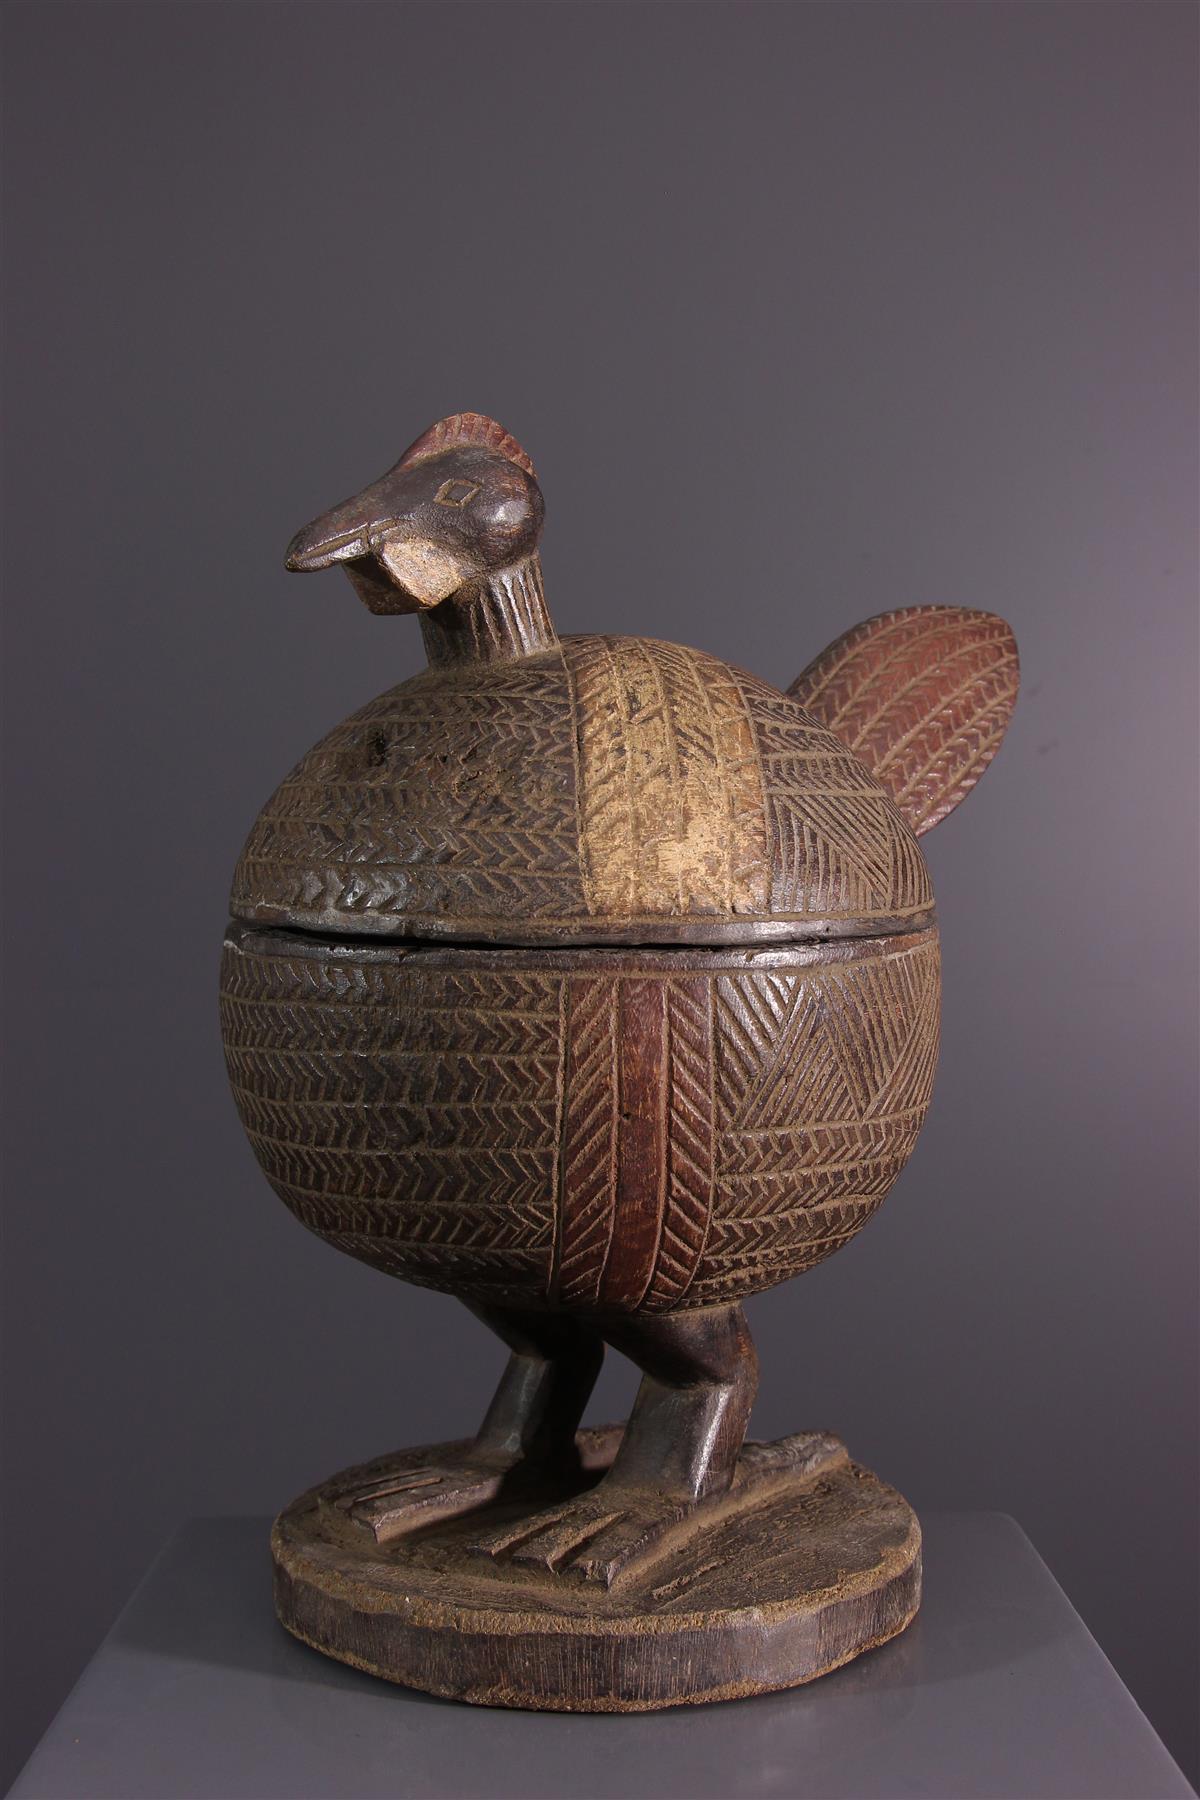 Yoruba Cup - African art